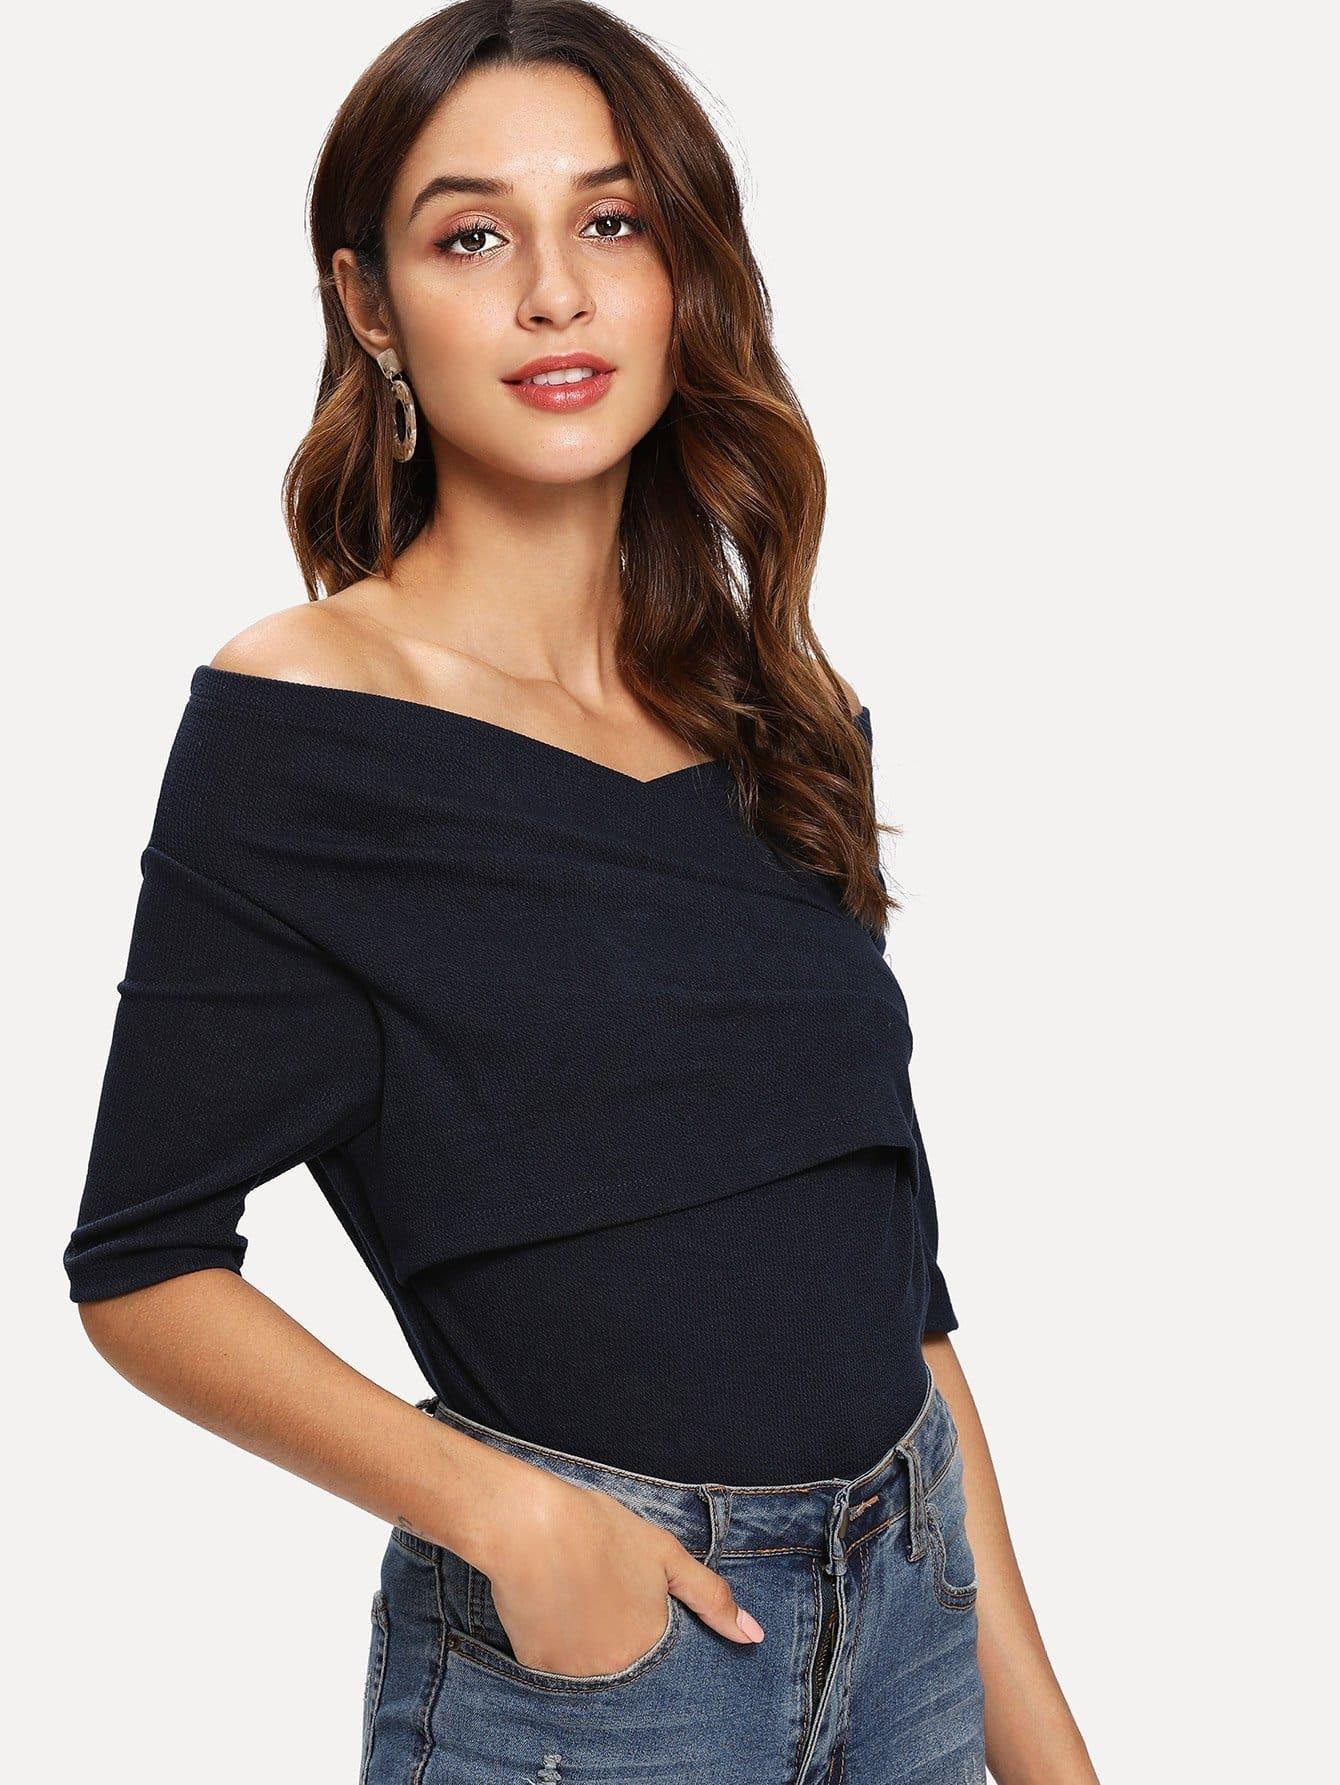 Cross Wrap Front Rib Knit T-shirt cutout front rib knit t shirt